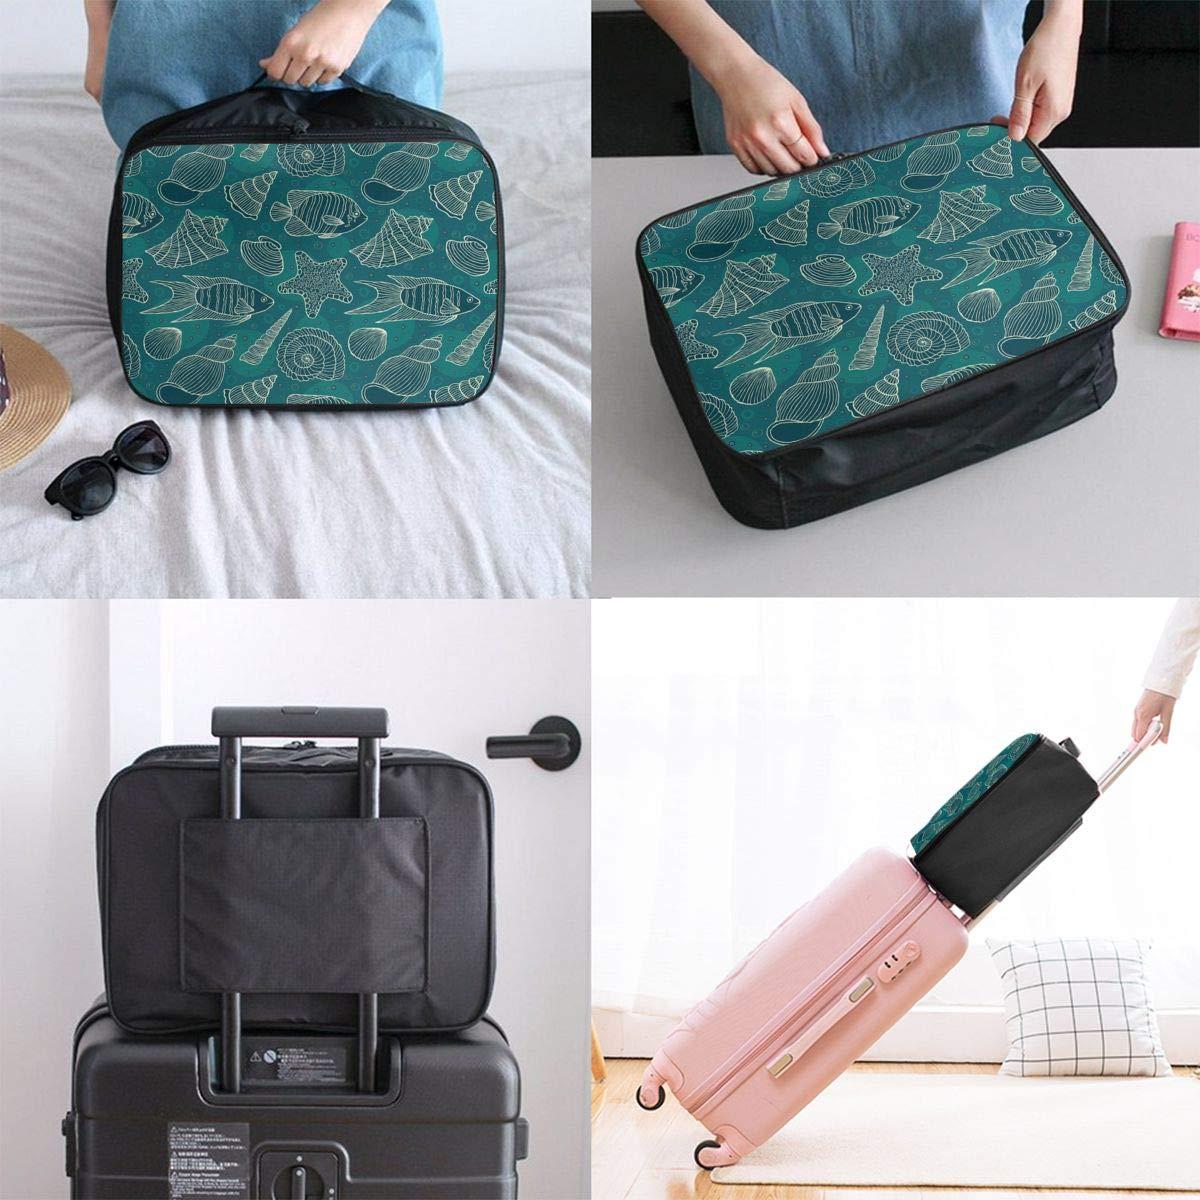 ADGAI Nautical Ocean Pattern Underwater Canvas Travel Weekender Bag,Fashion Custom Lightweight Large Capacity Portable Luggage Bag,Suitcase Trolley Bag